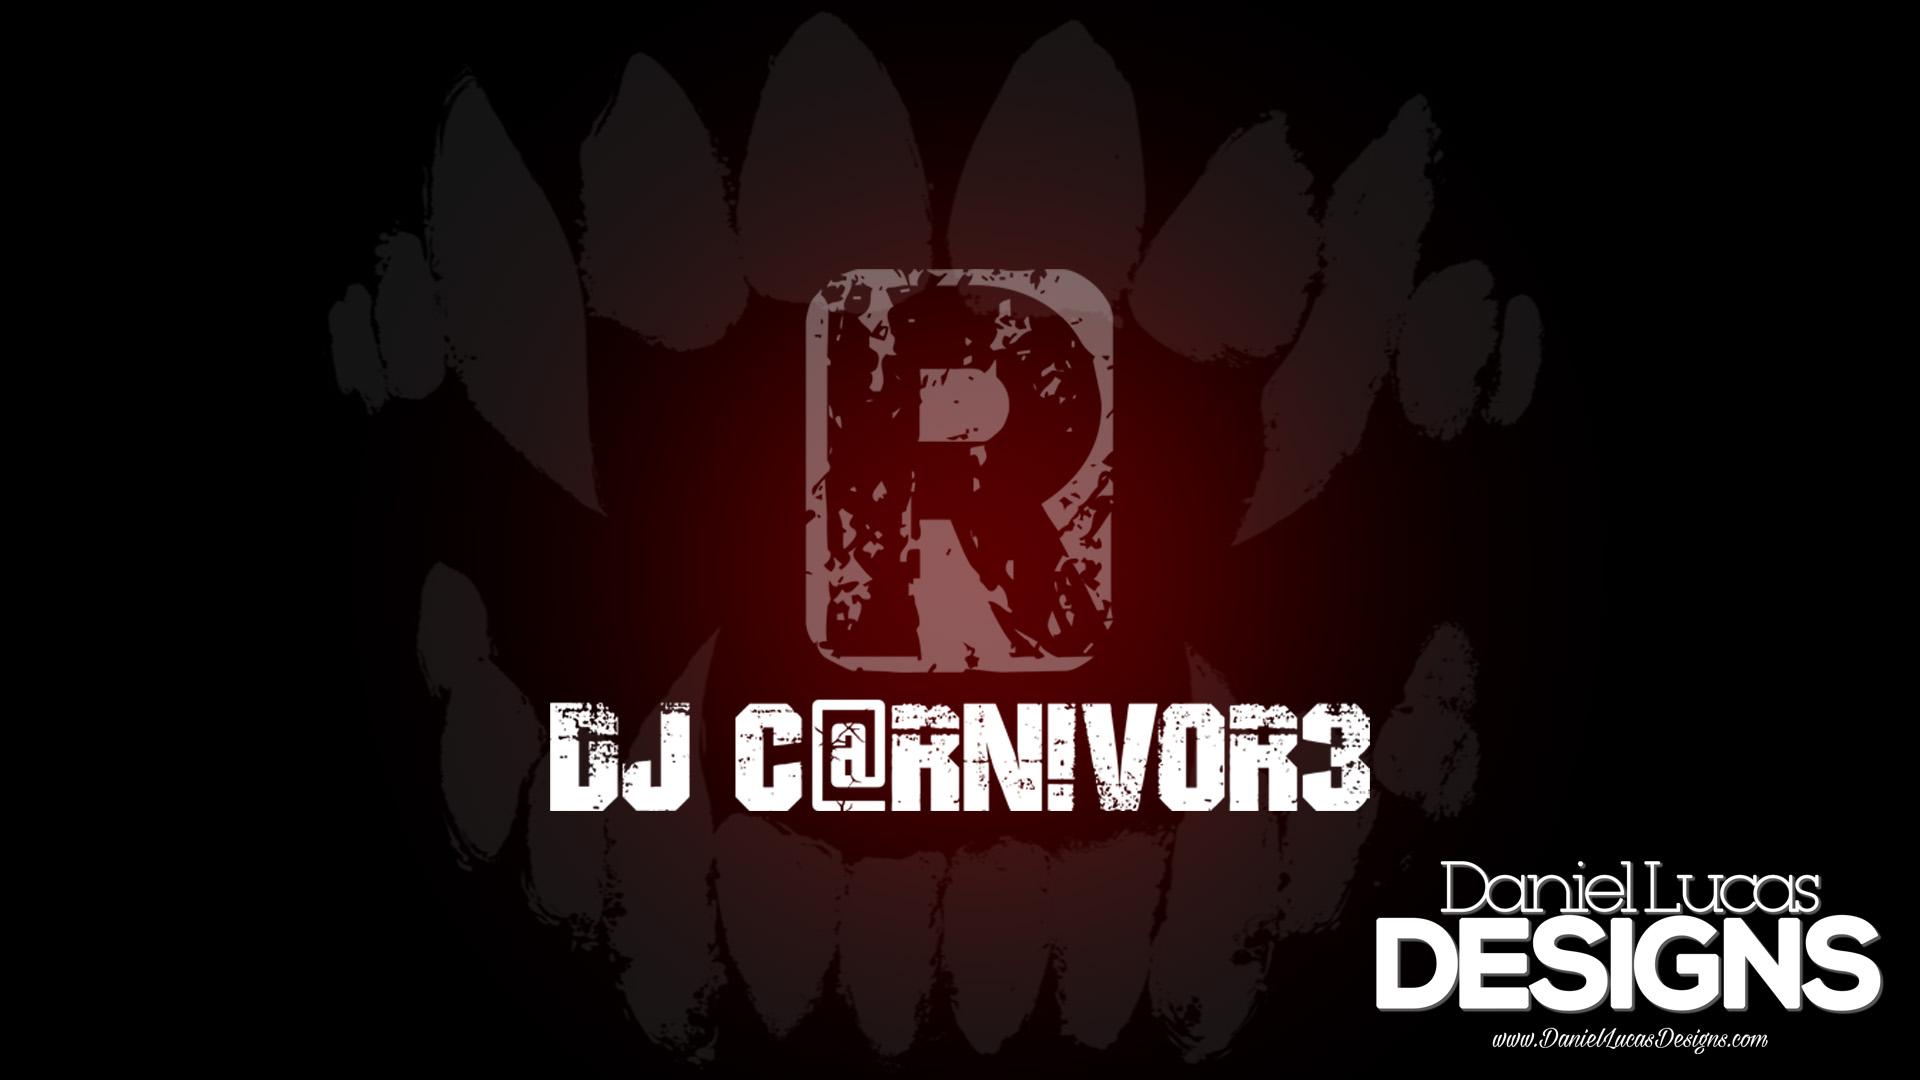 DJ C@RN!-v0r3